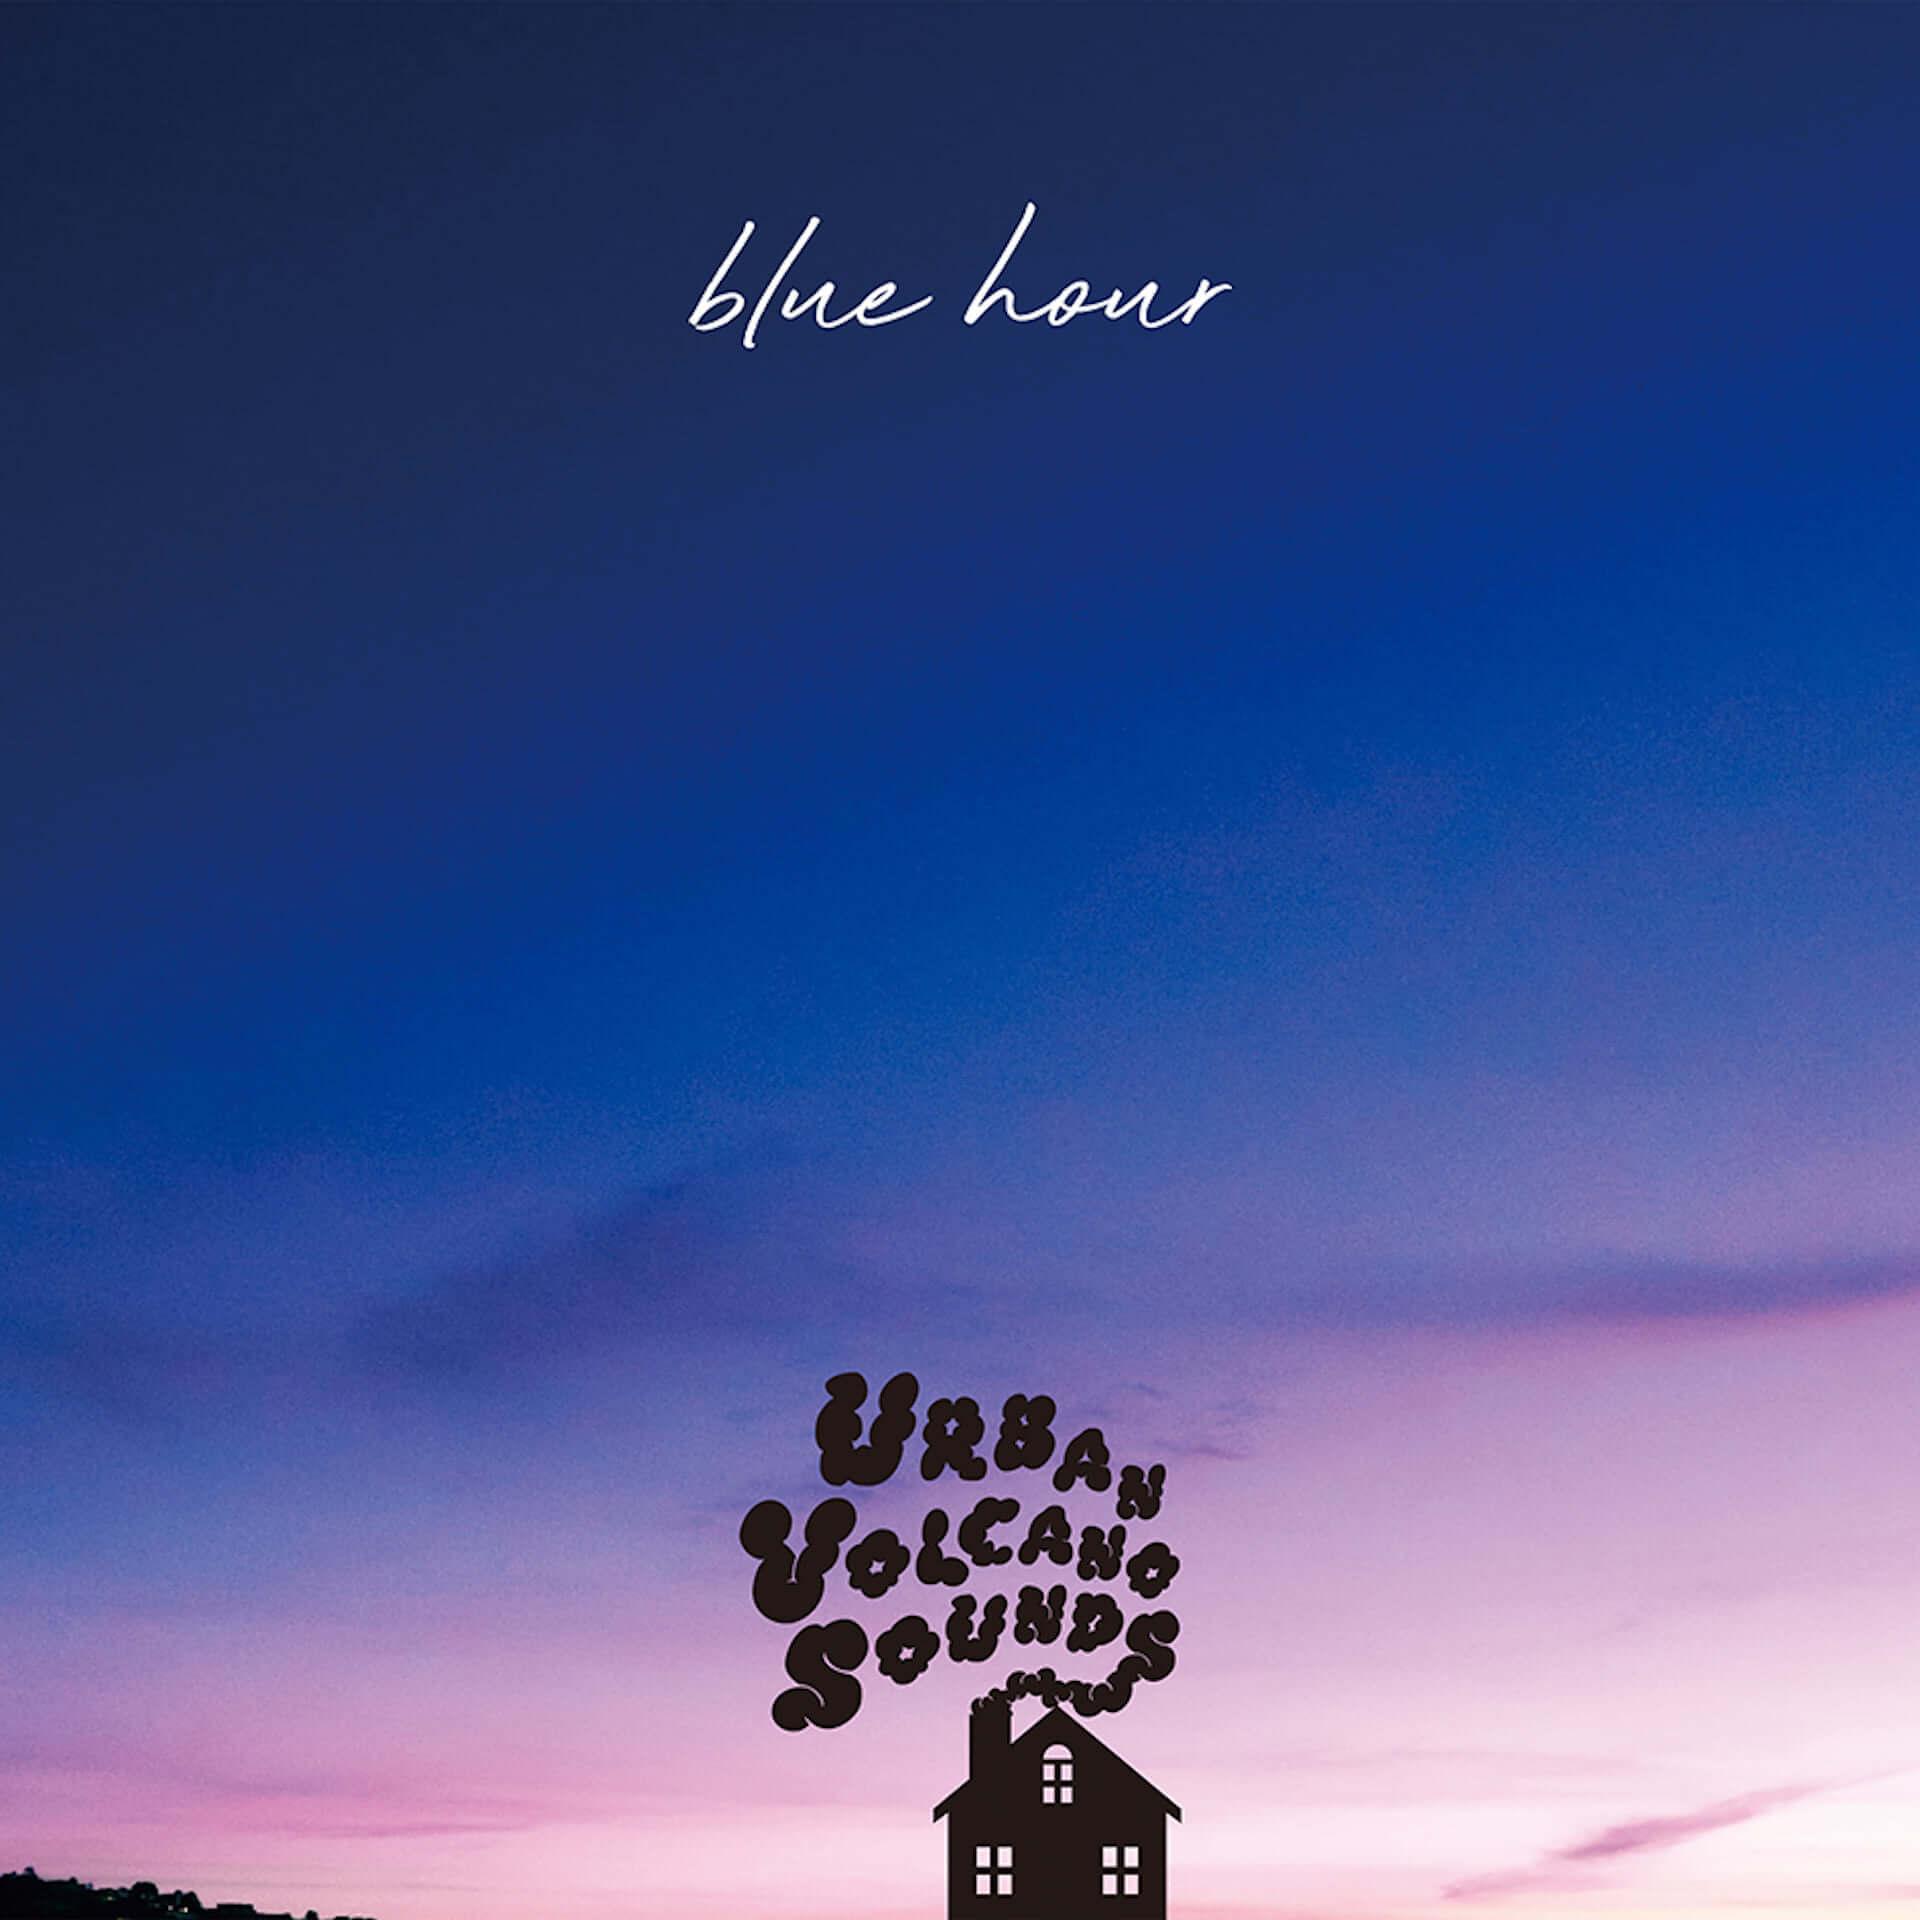 KEN KENとhacchiによるユニット・URBAN VOLCANO SOUNDSが1stフルアルバム『blue hour』を発売決定!坂本慎太郎、VIDEOTAPEMUSICらの推薦文も到着 music201016_urban-volcano-sounds_1-1920x1920